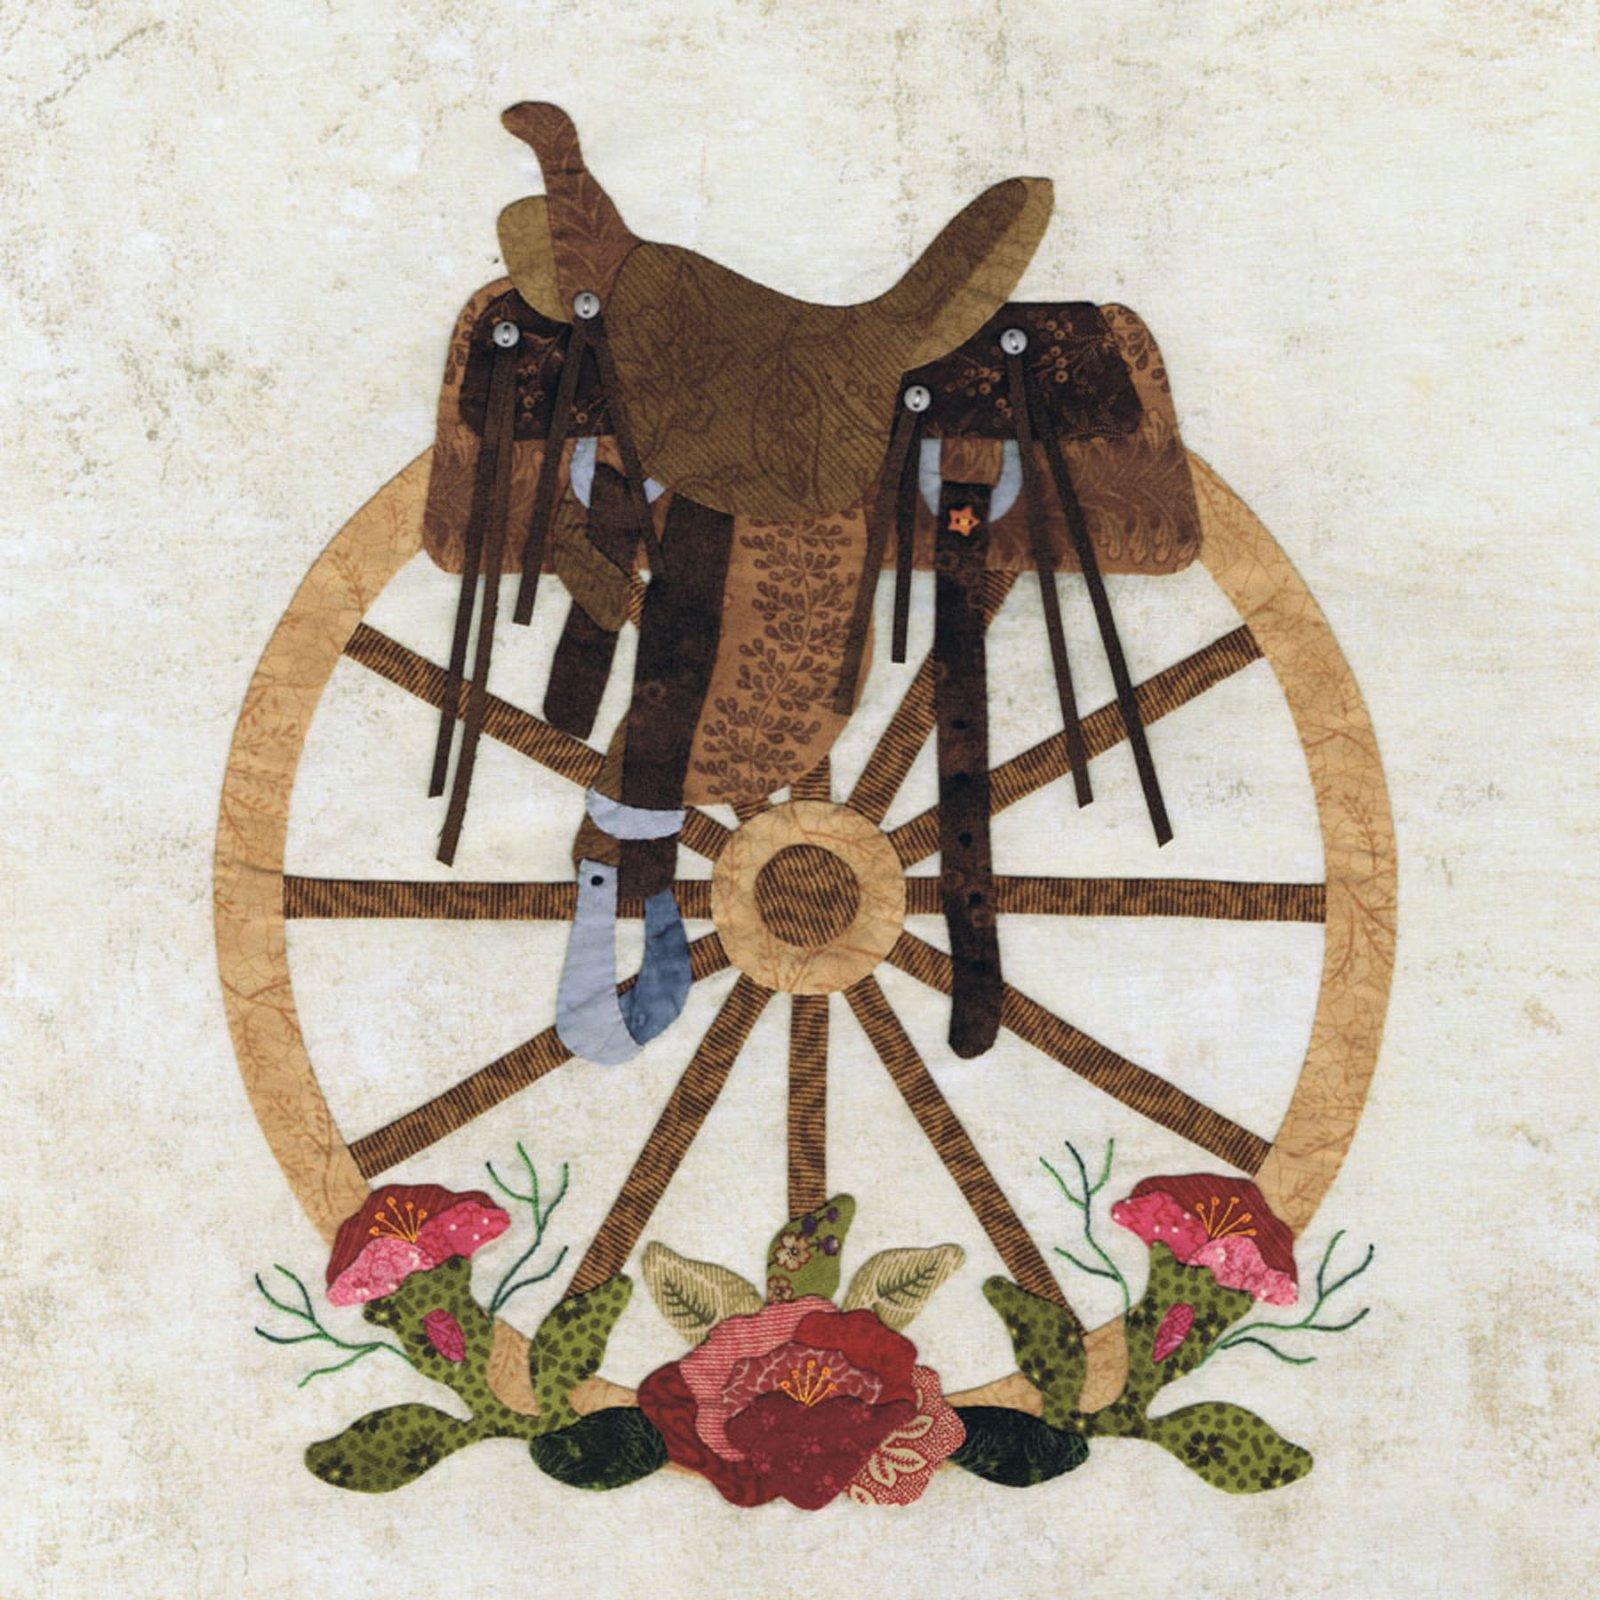 P3-1901 Wagon Wheel Wreath